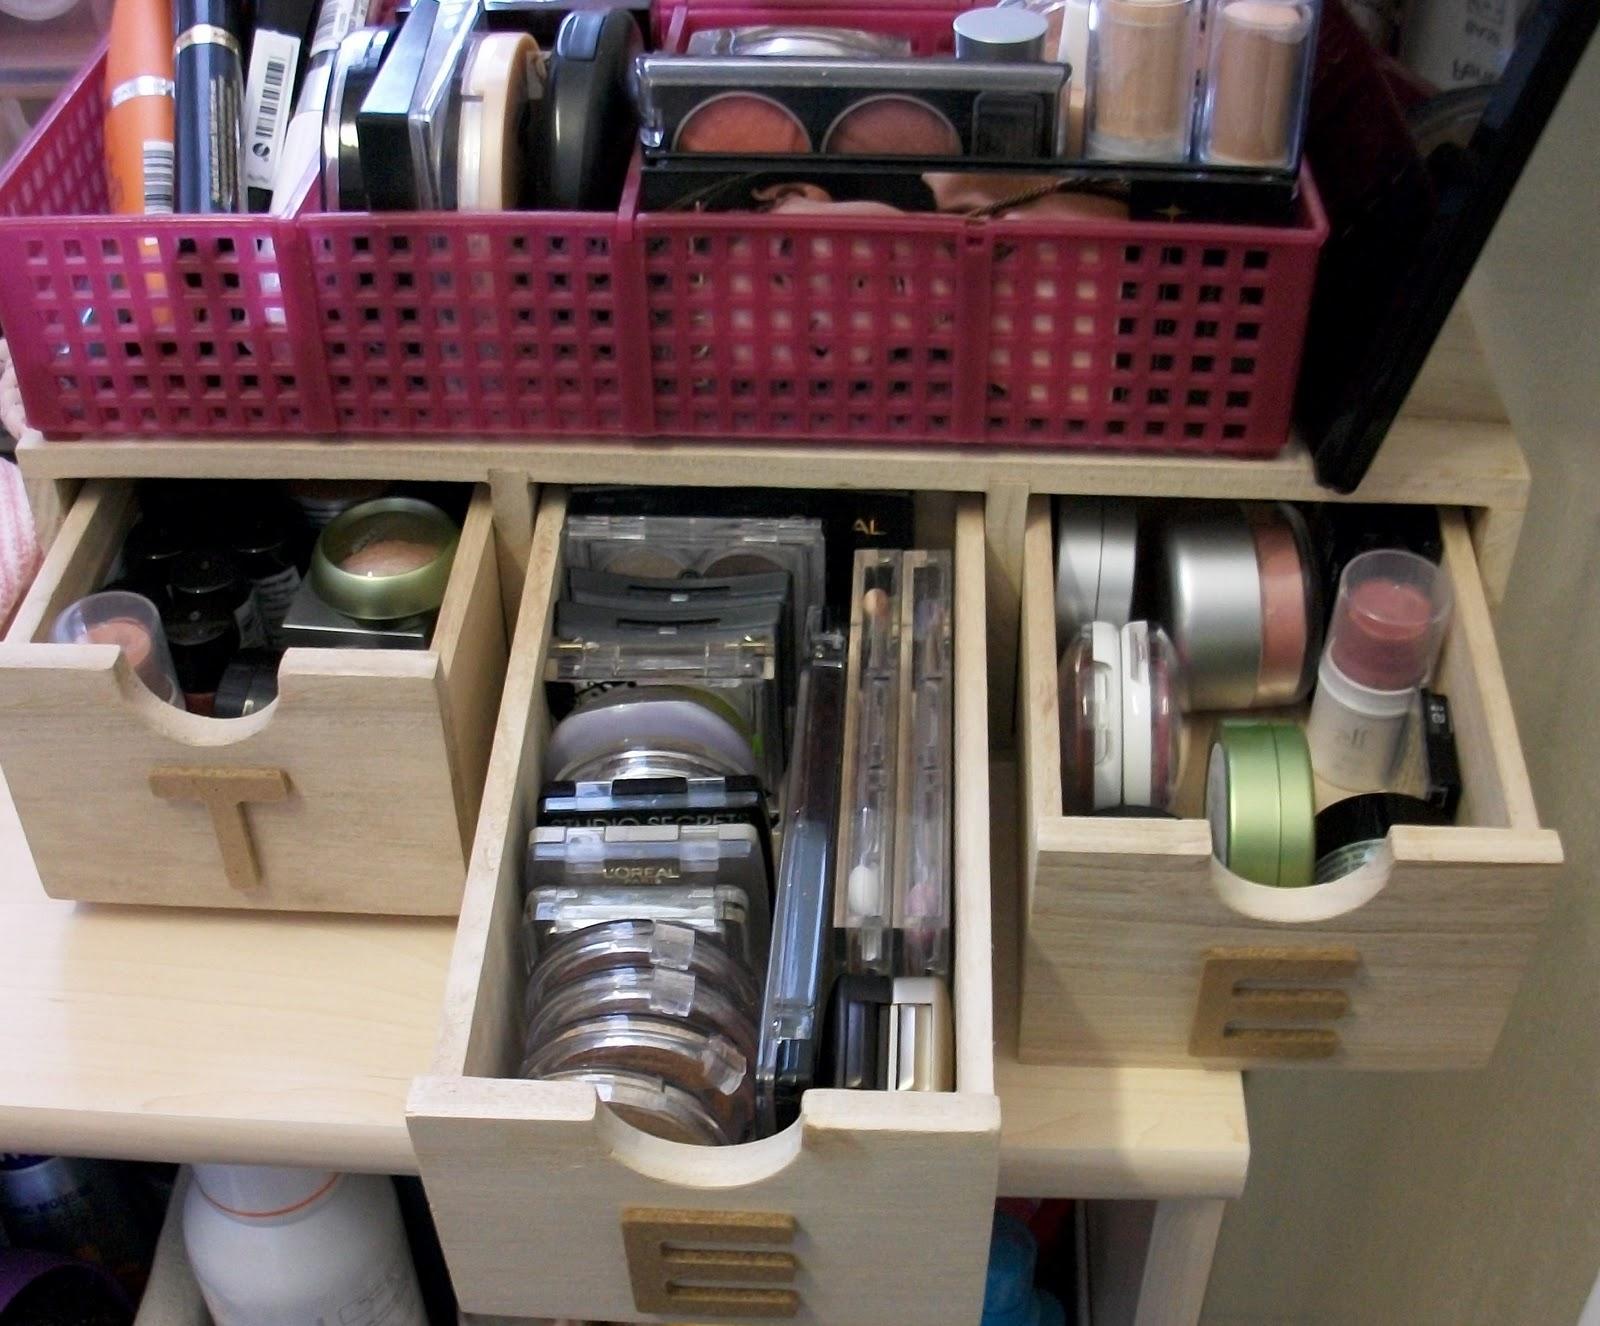 Badezimmer aufbewahrung: ideas about ikea badezimmer on pinterest ...